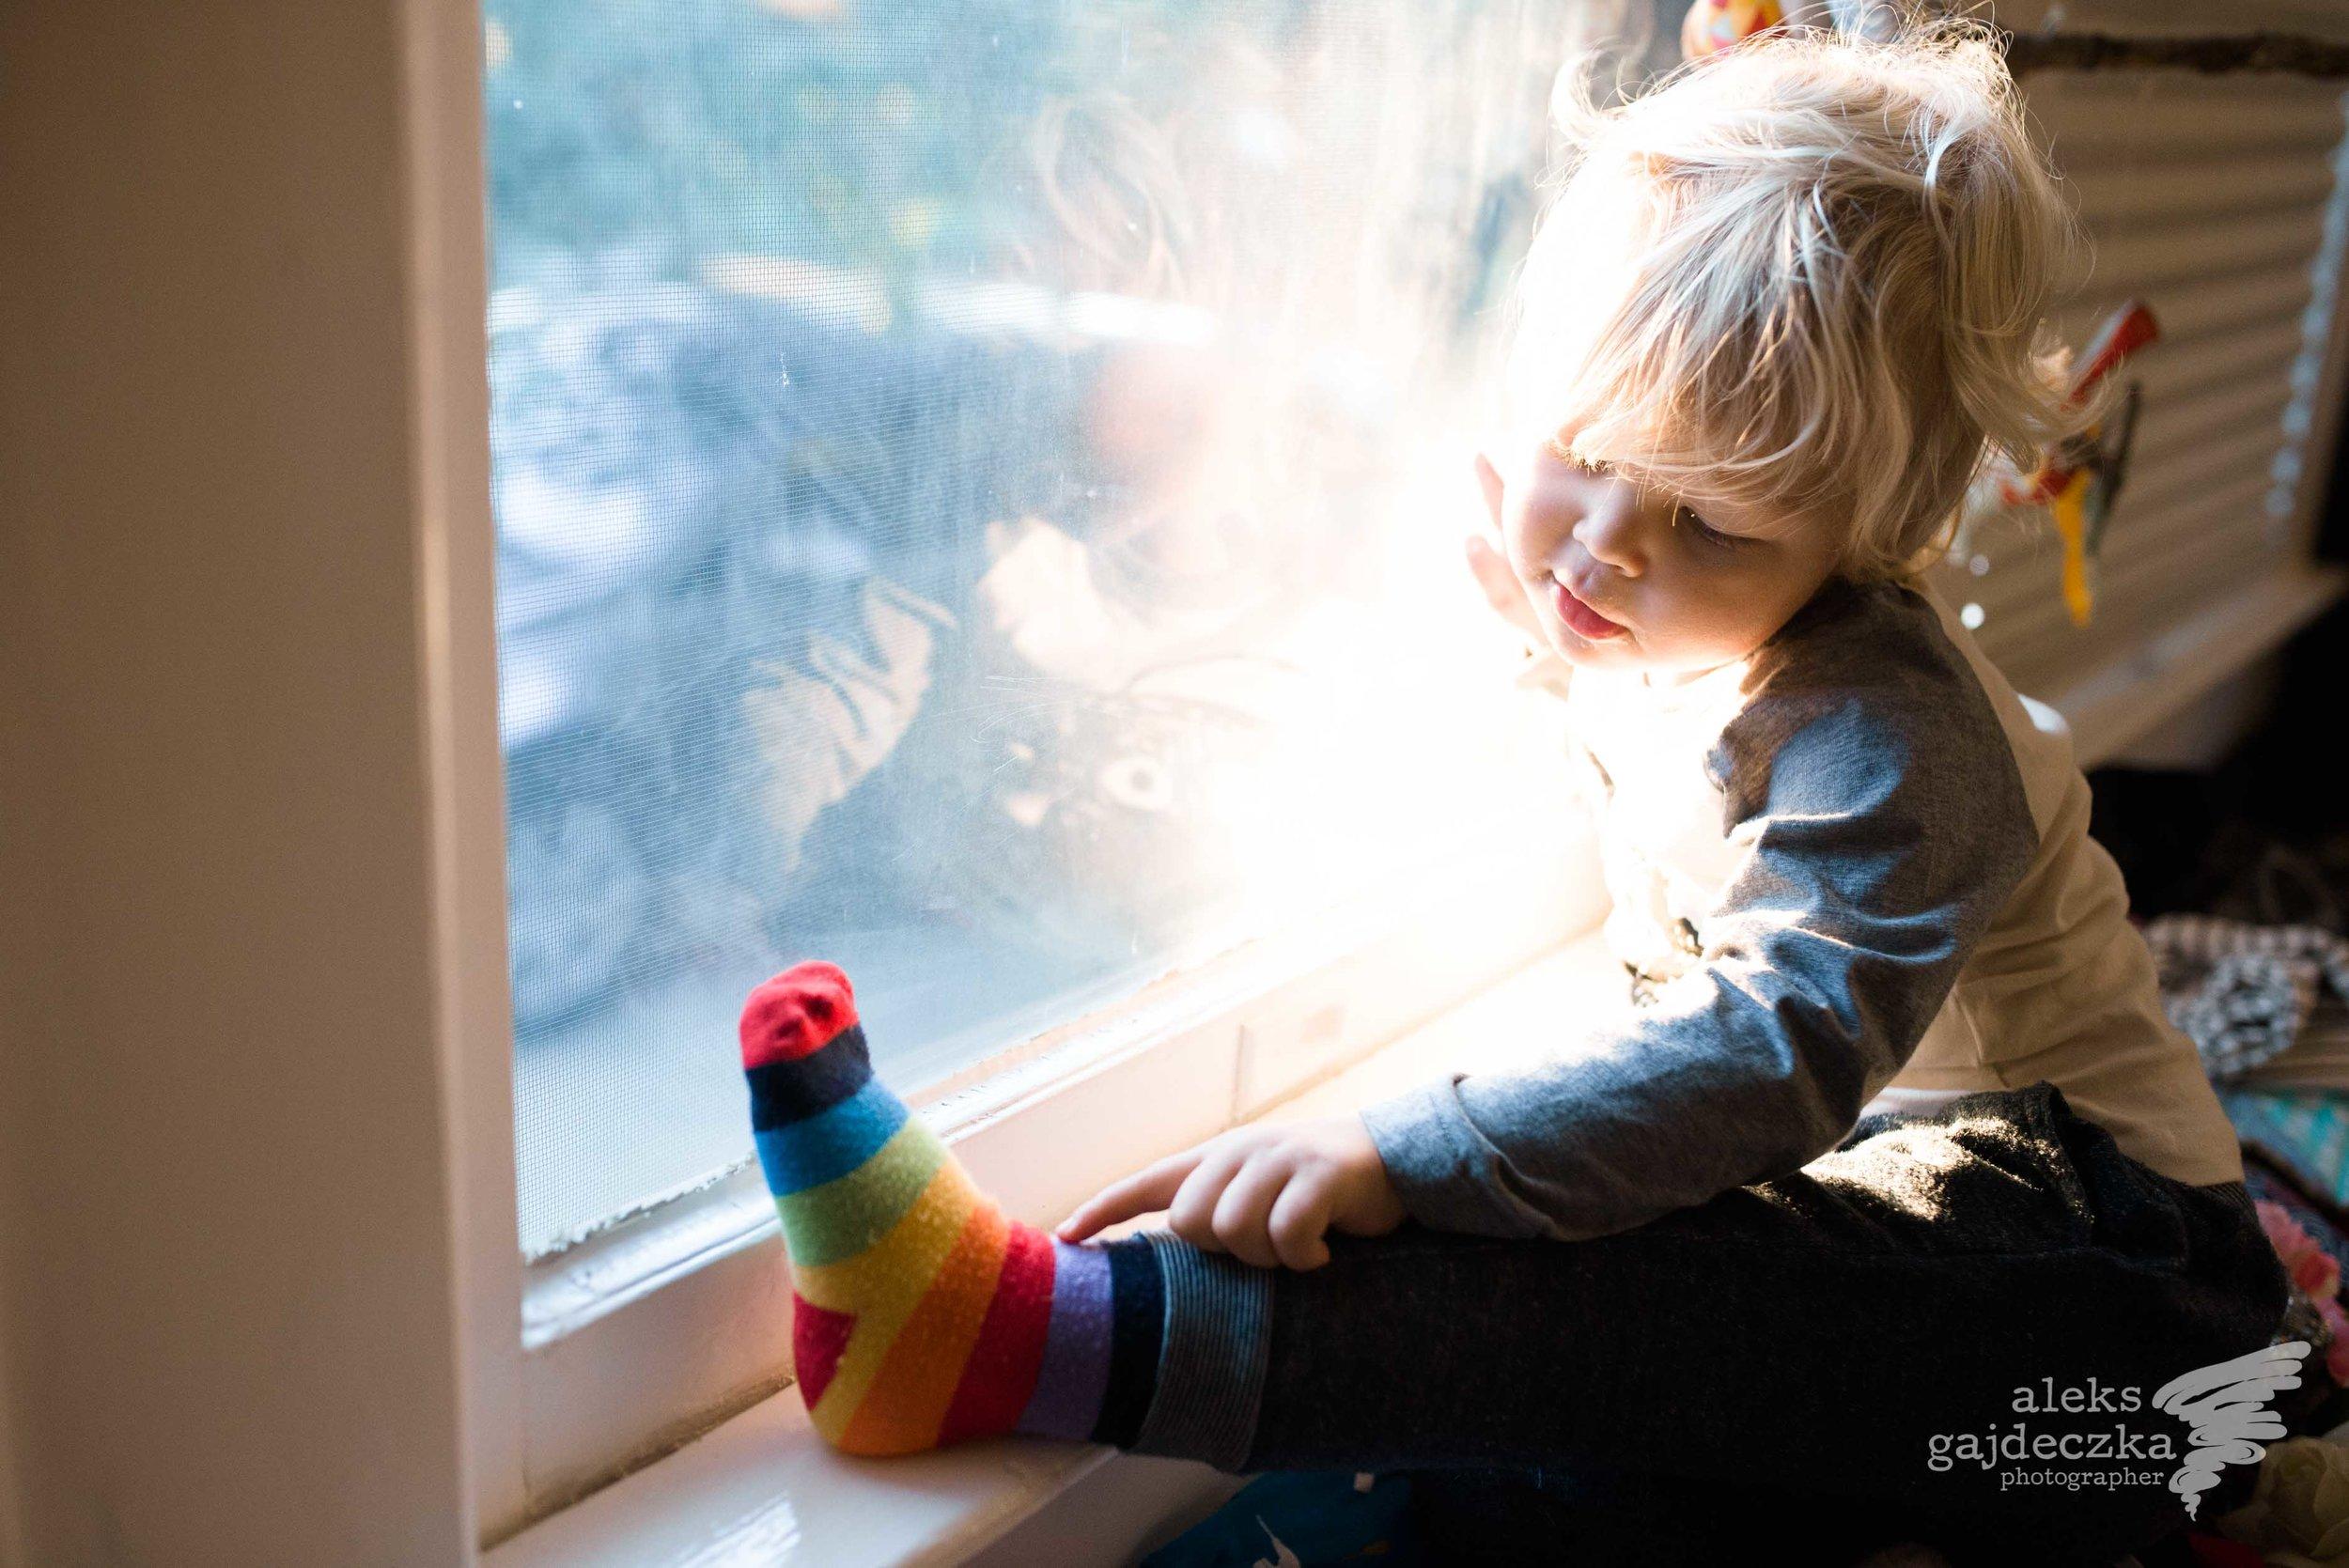 austin-family-photojournalism-documentary-photography.jpg